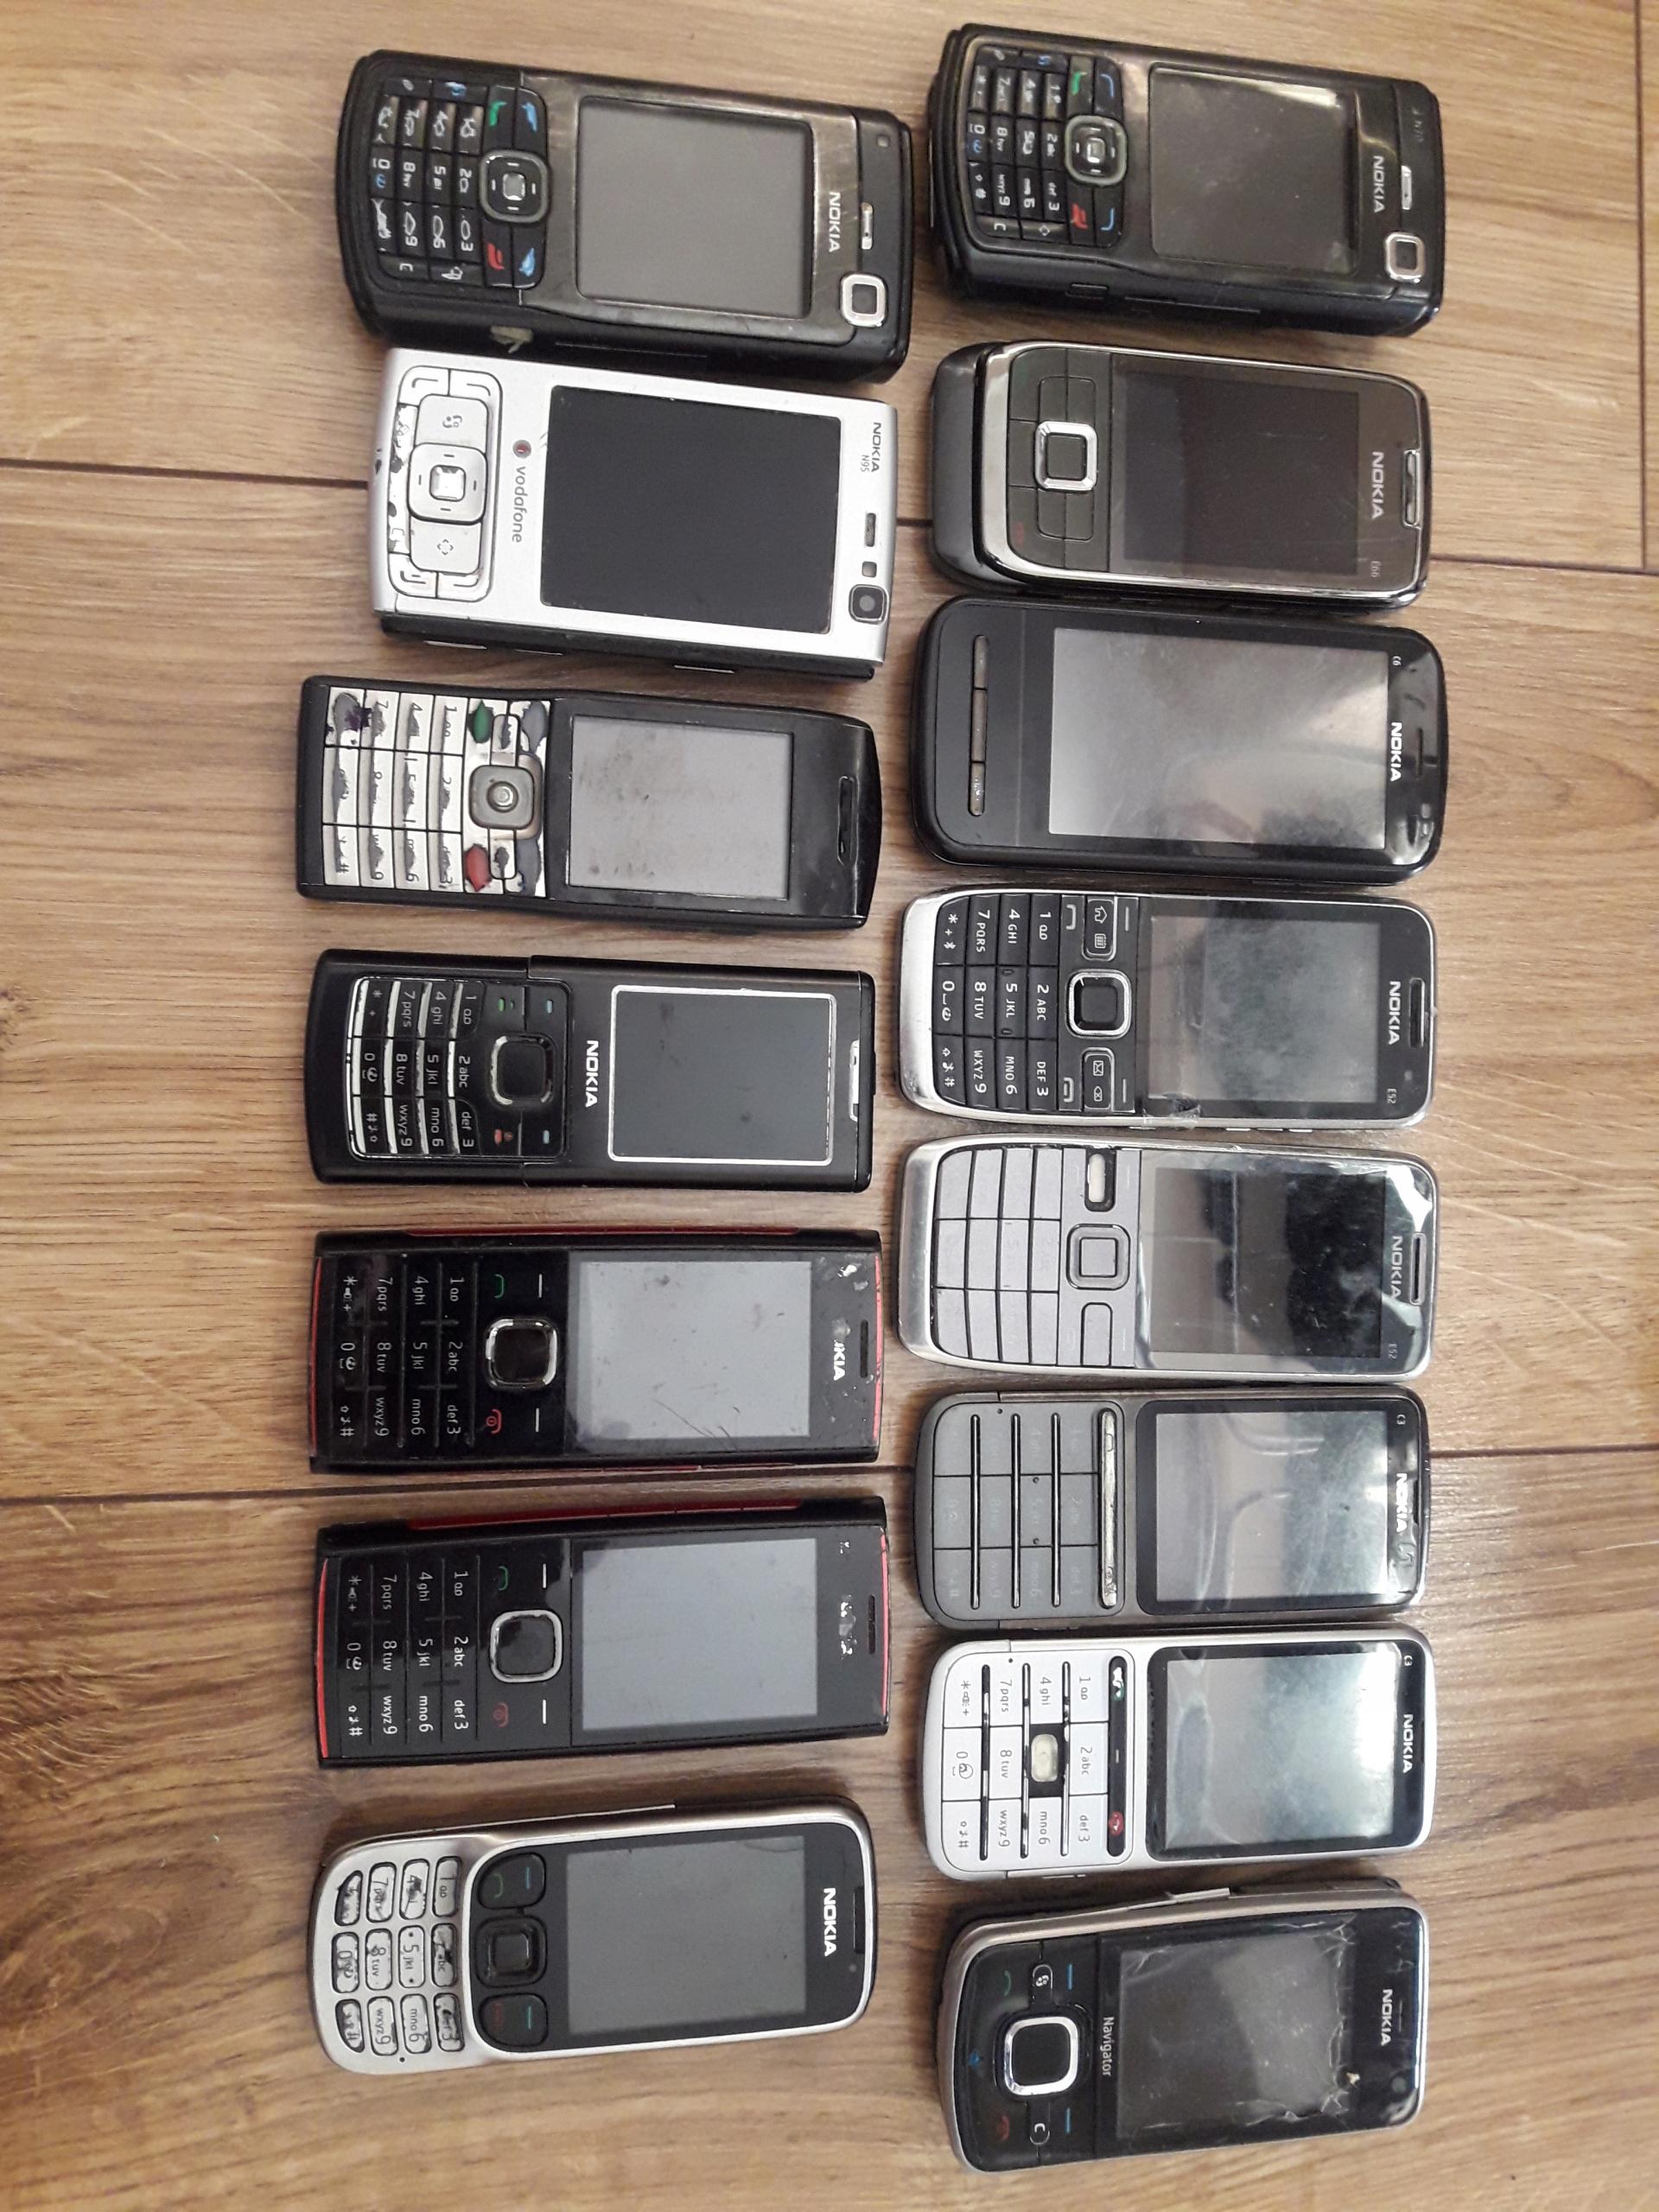 15 x Zestaw Paczka Nokia N70 N95 E66 E52 X2 C3 C6